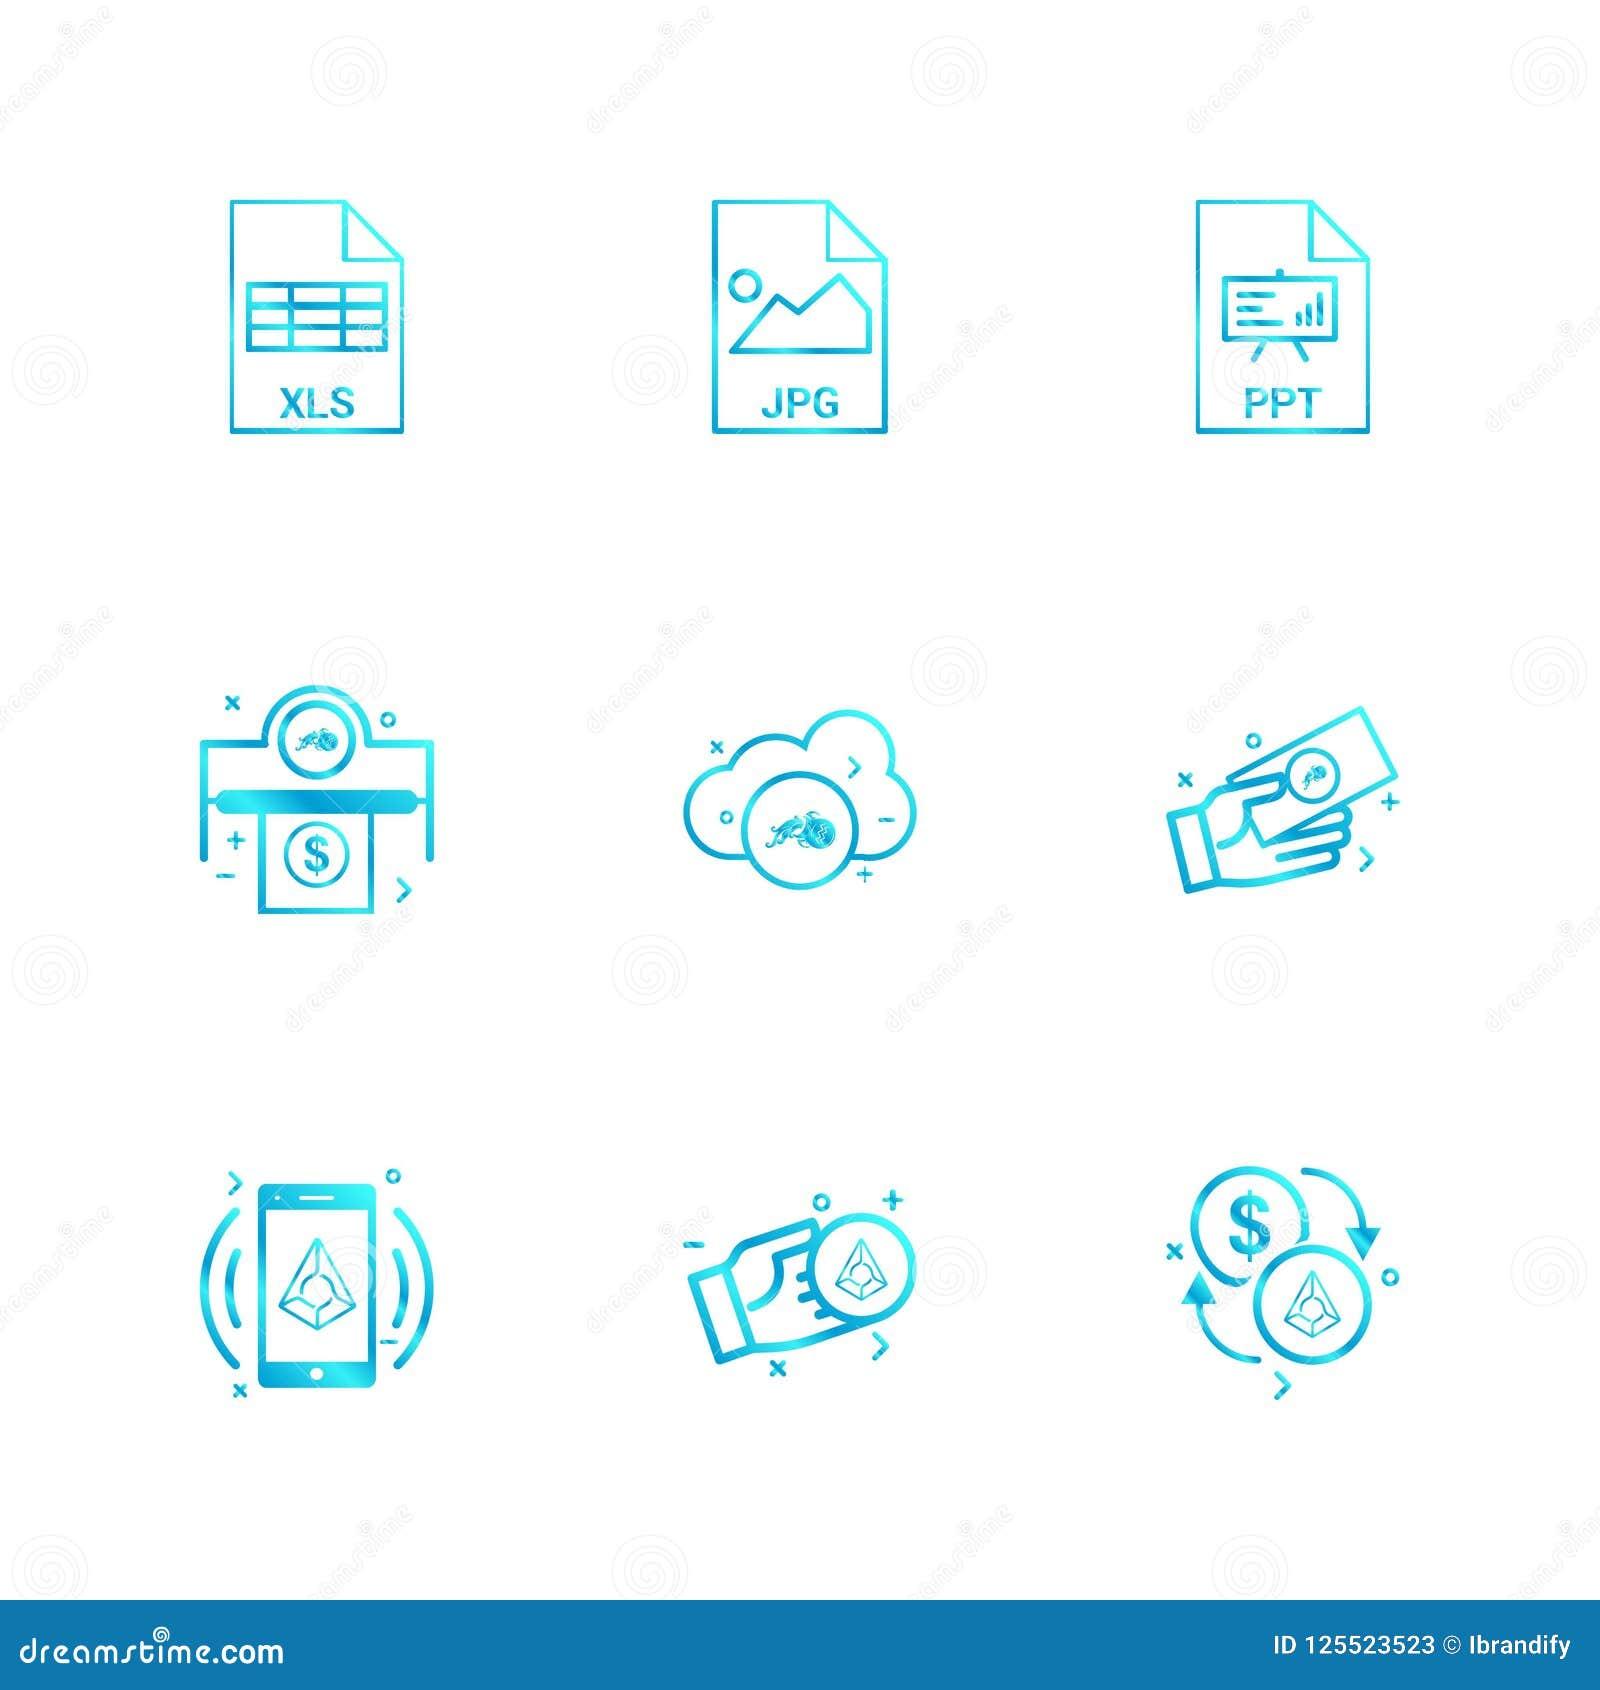 Xls, jpg, ppt, dólar, moneda crypto, daimond, dinero, MES